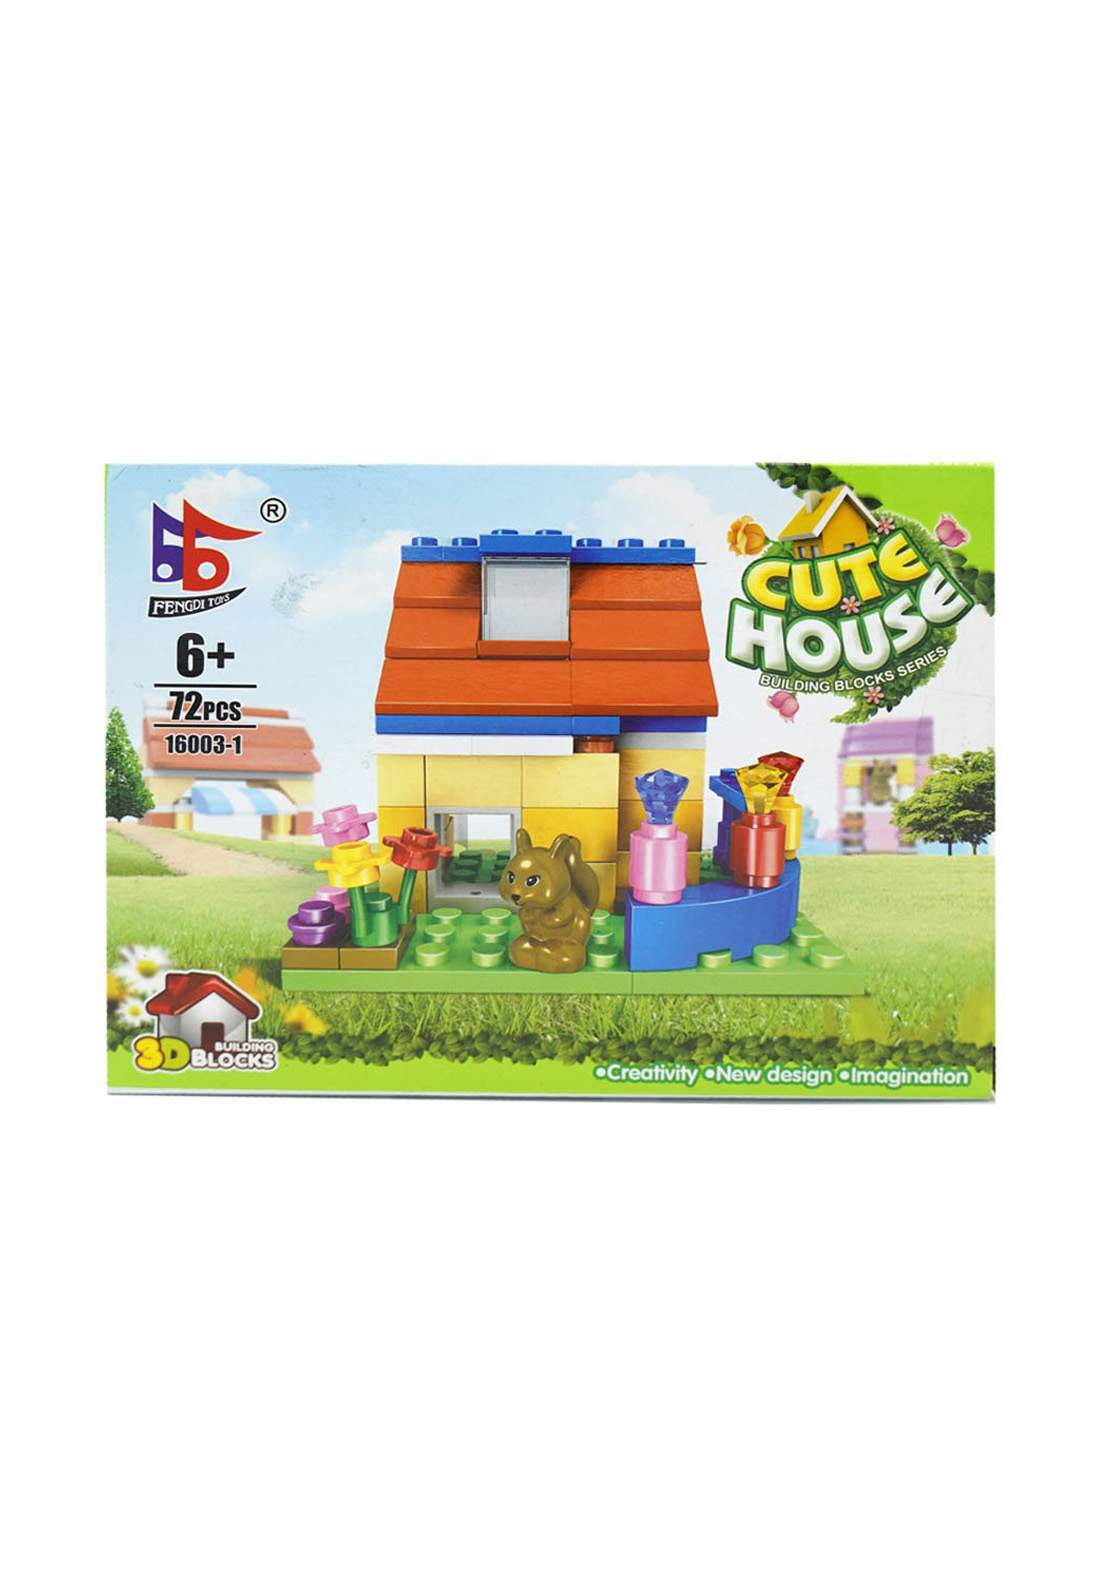 Lego Cute House +6Y ( 16003-1) مكعبات بناء منزل للأطفال